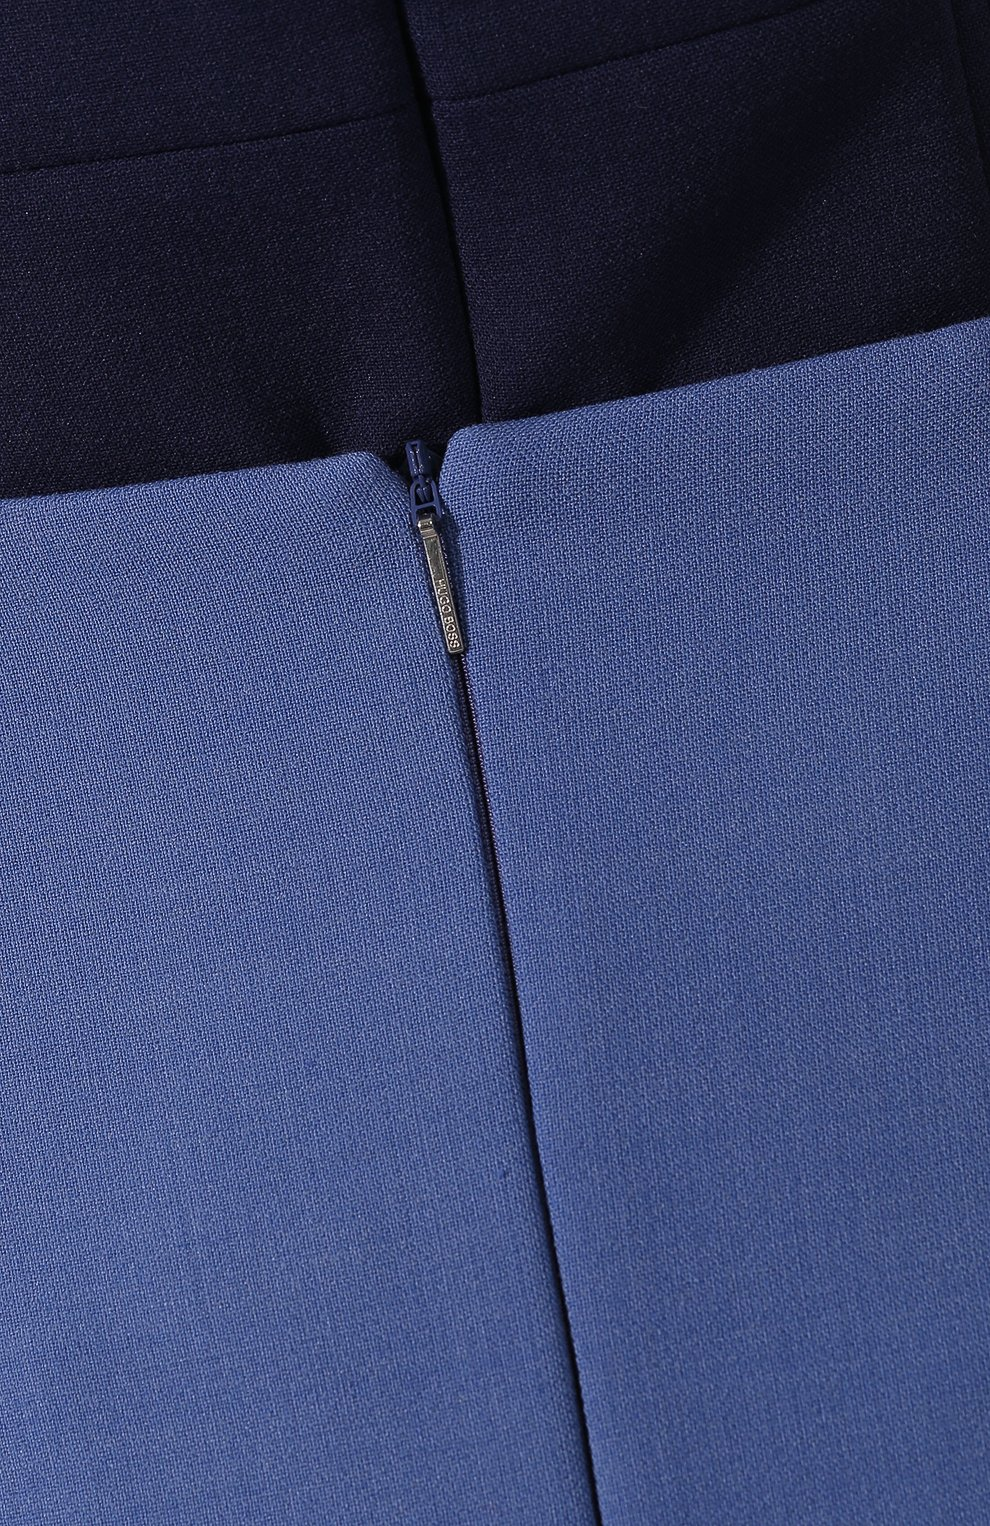 Женская юбка-карандаш BOSS голубого цвета, арт. 50400506 | Фото 5